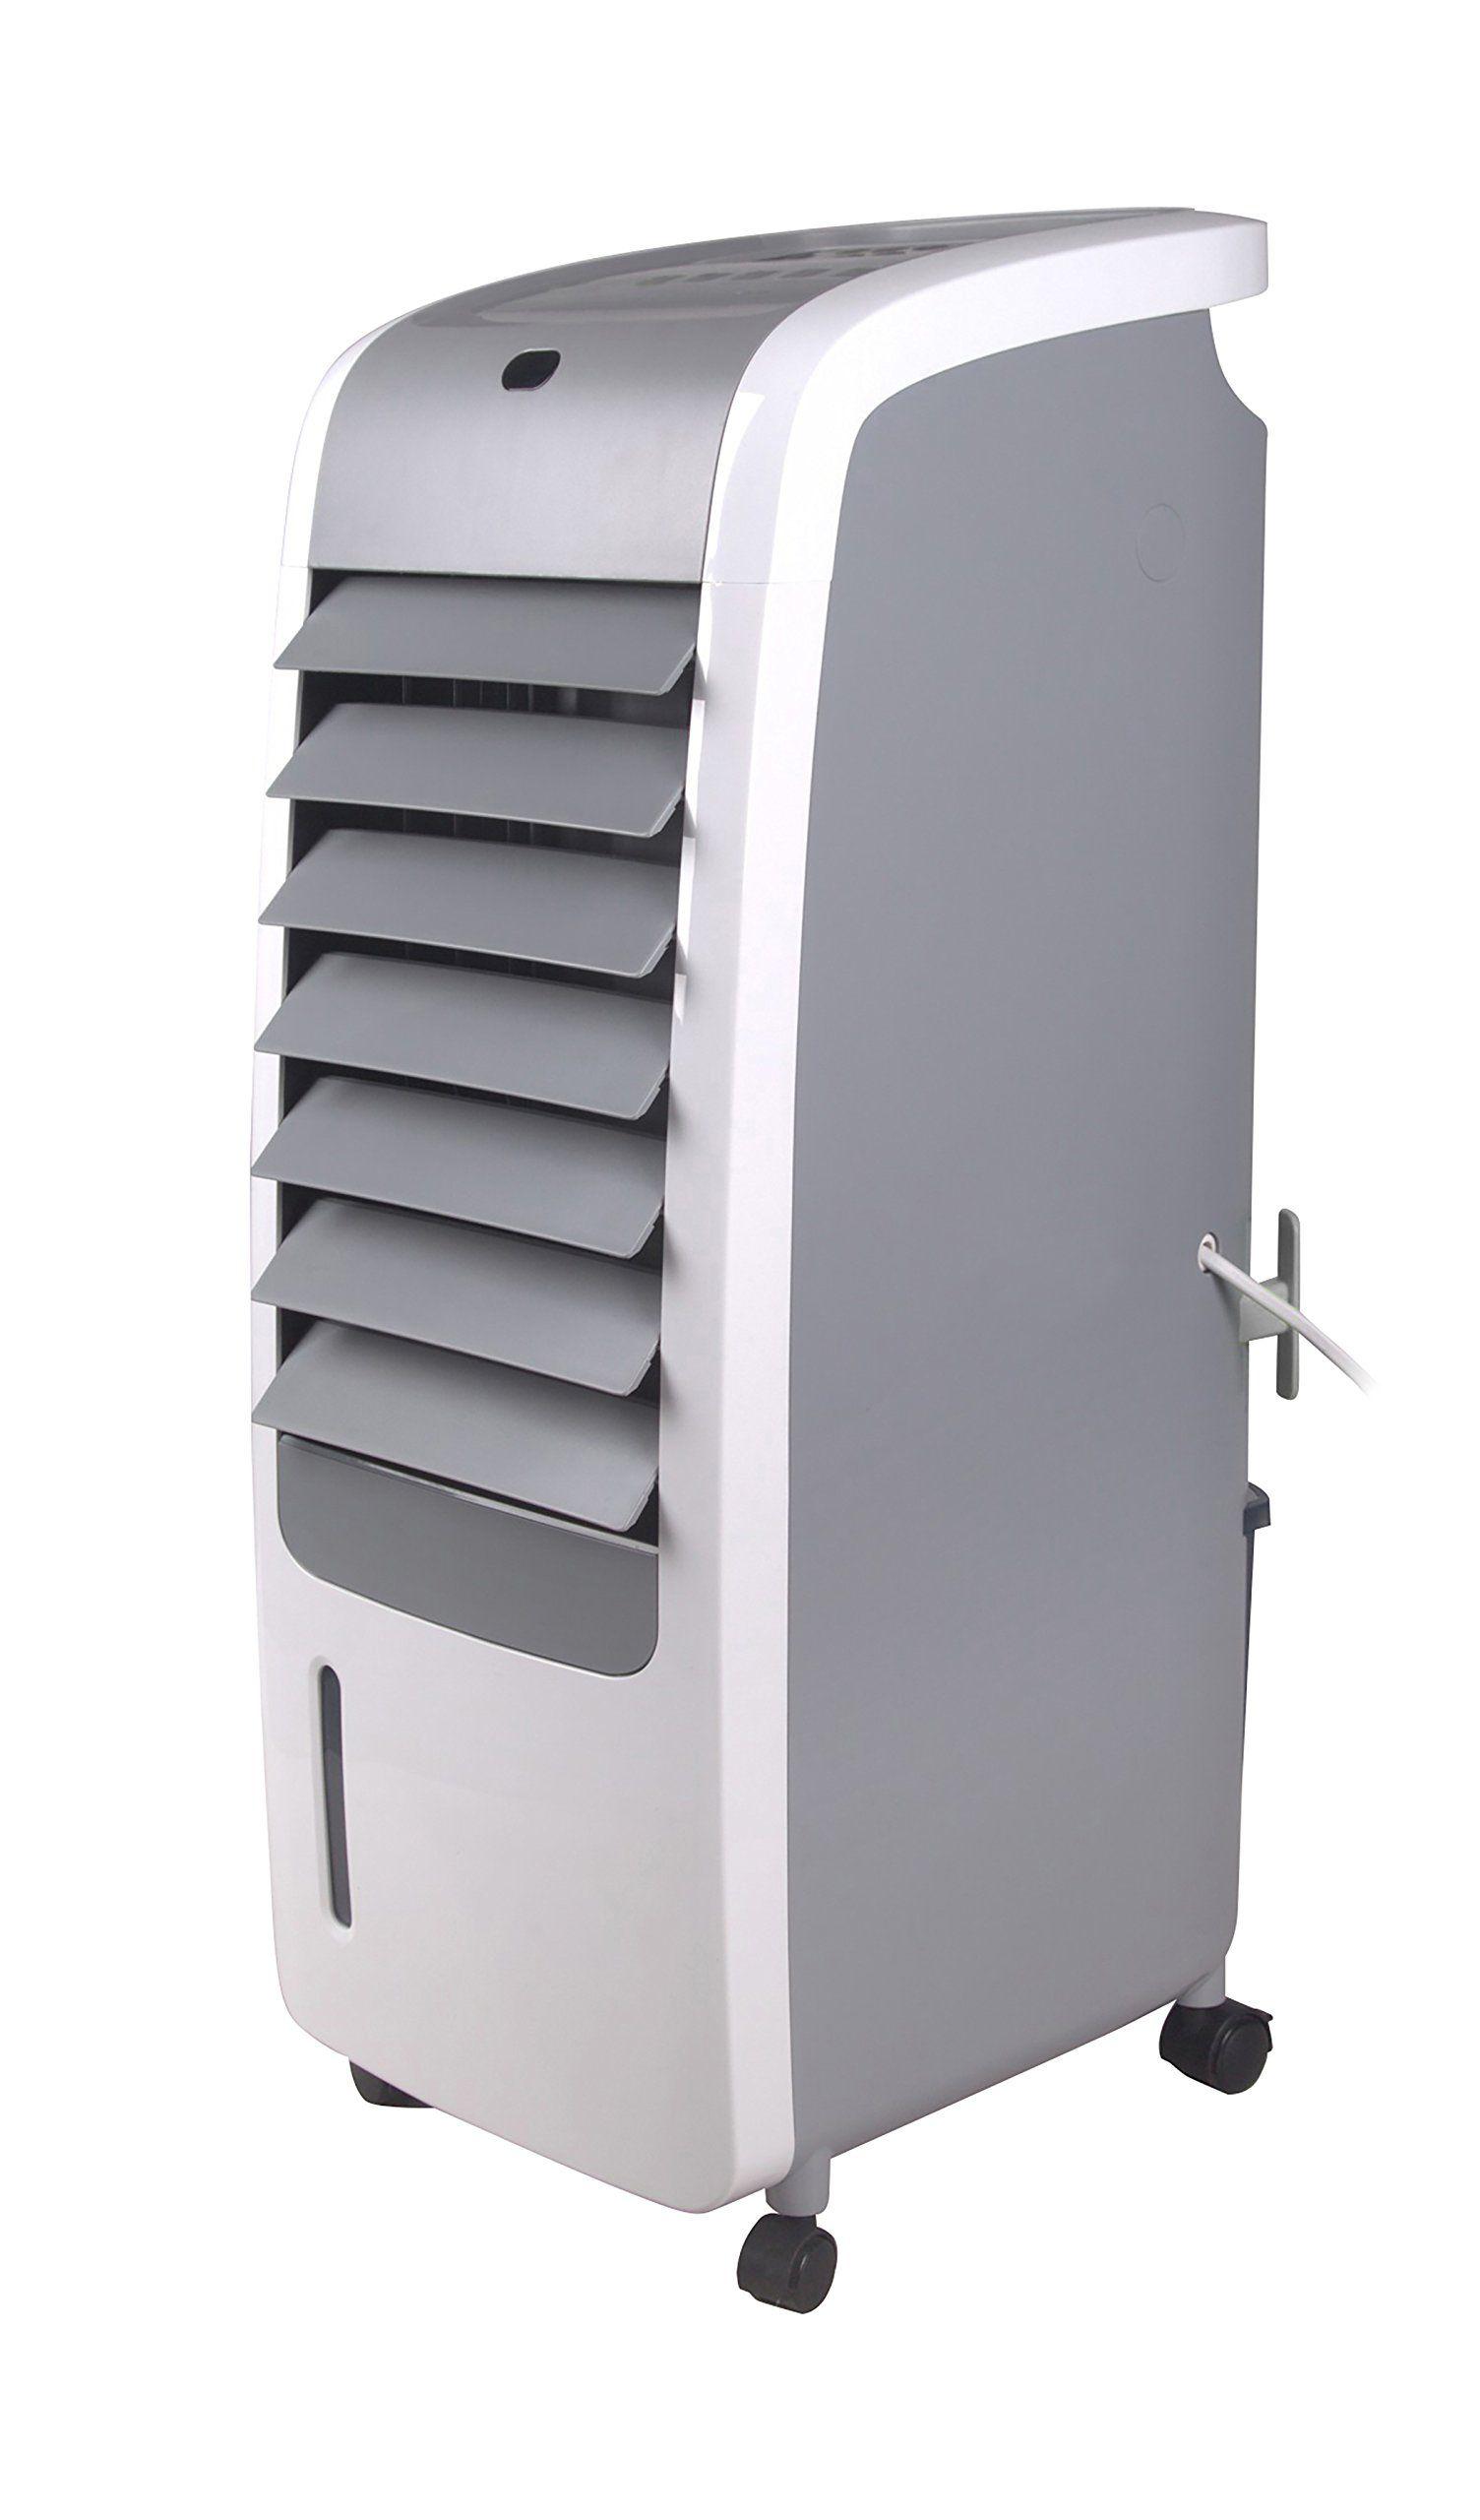 155 CFM Indoor Evaporative Air Cooler with Remote Control